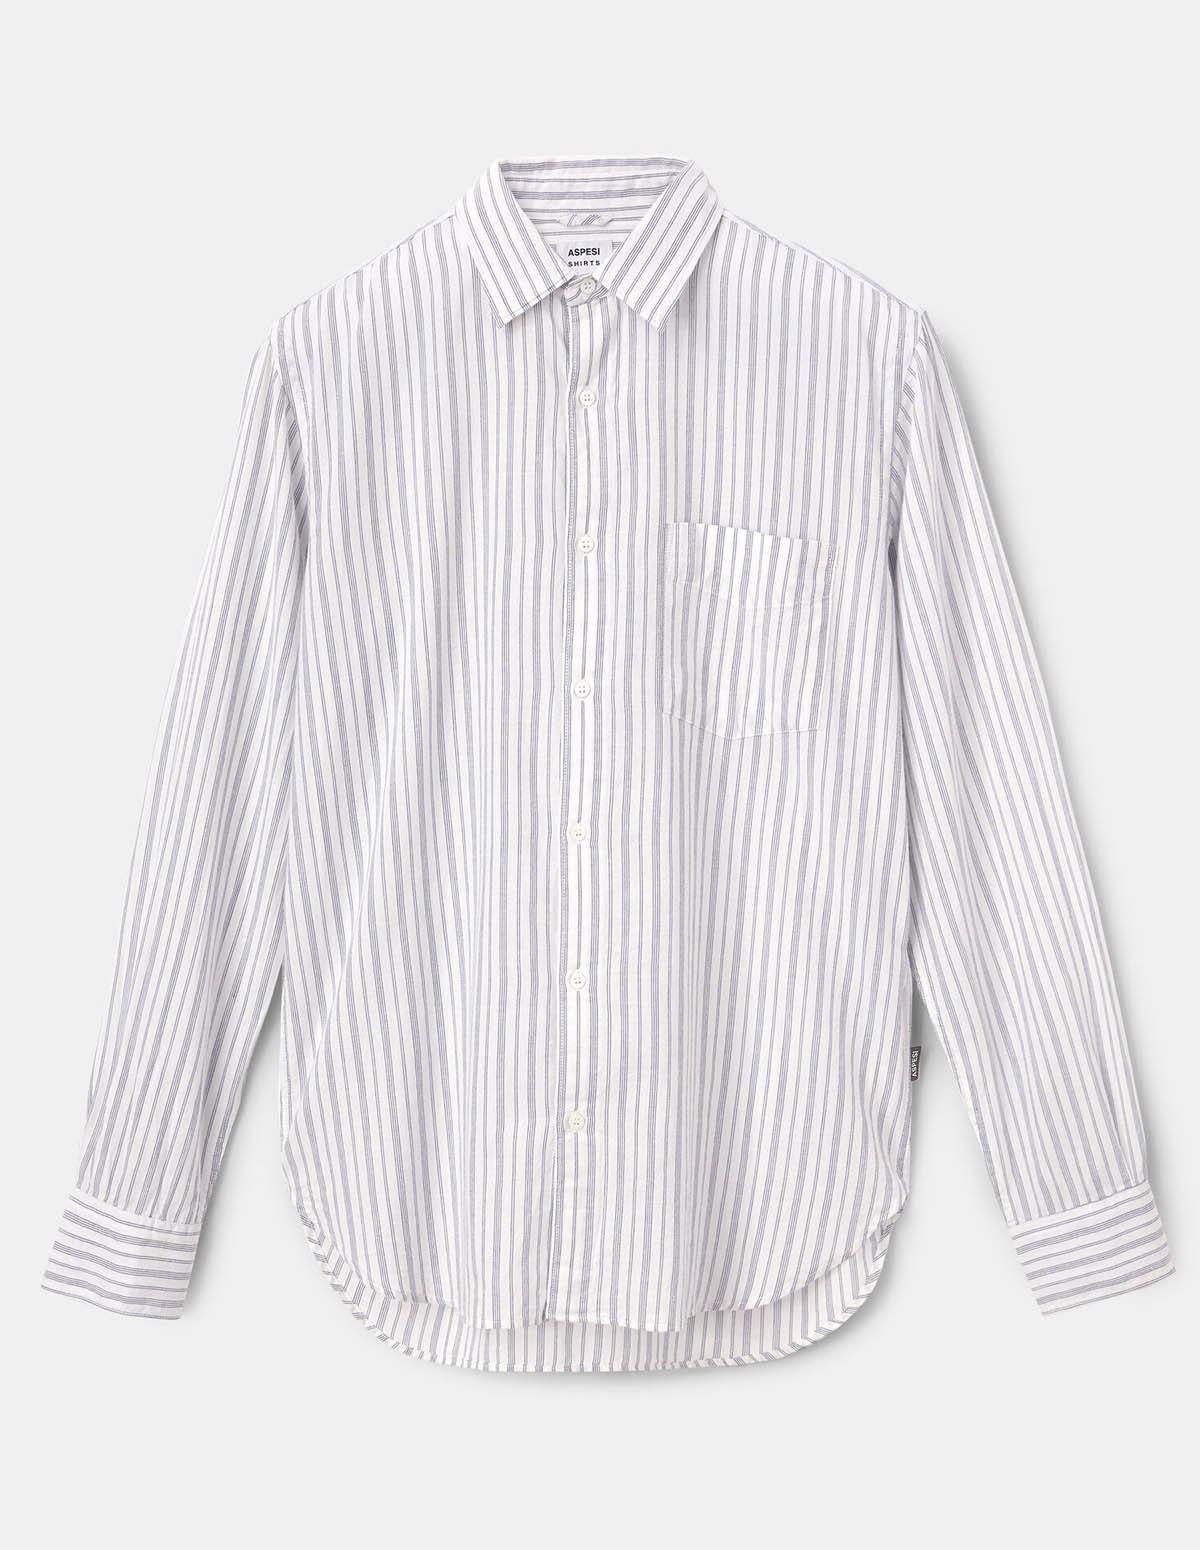 Aspesi Ridotta Ii Shirt - MICROSTRIPE BLU